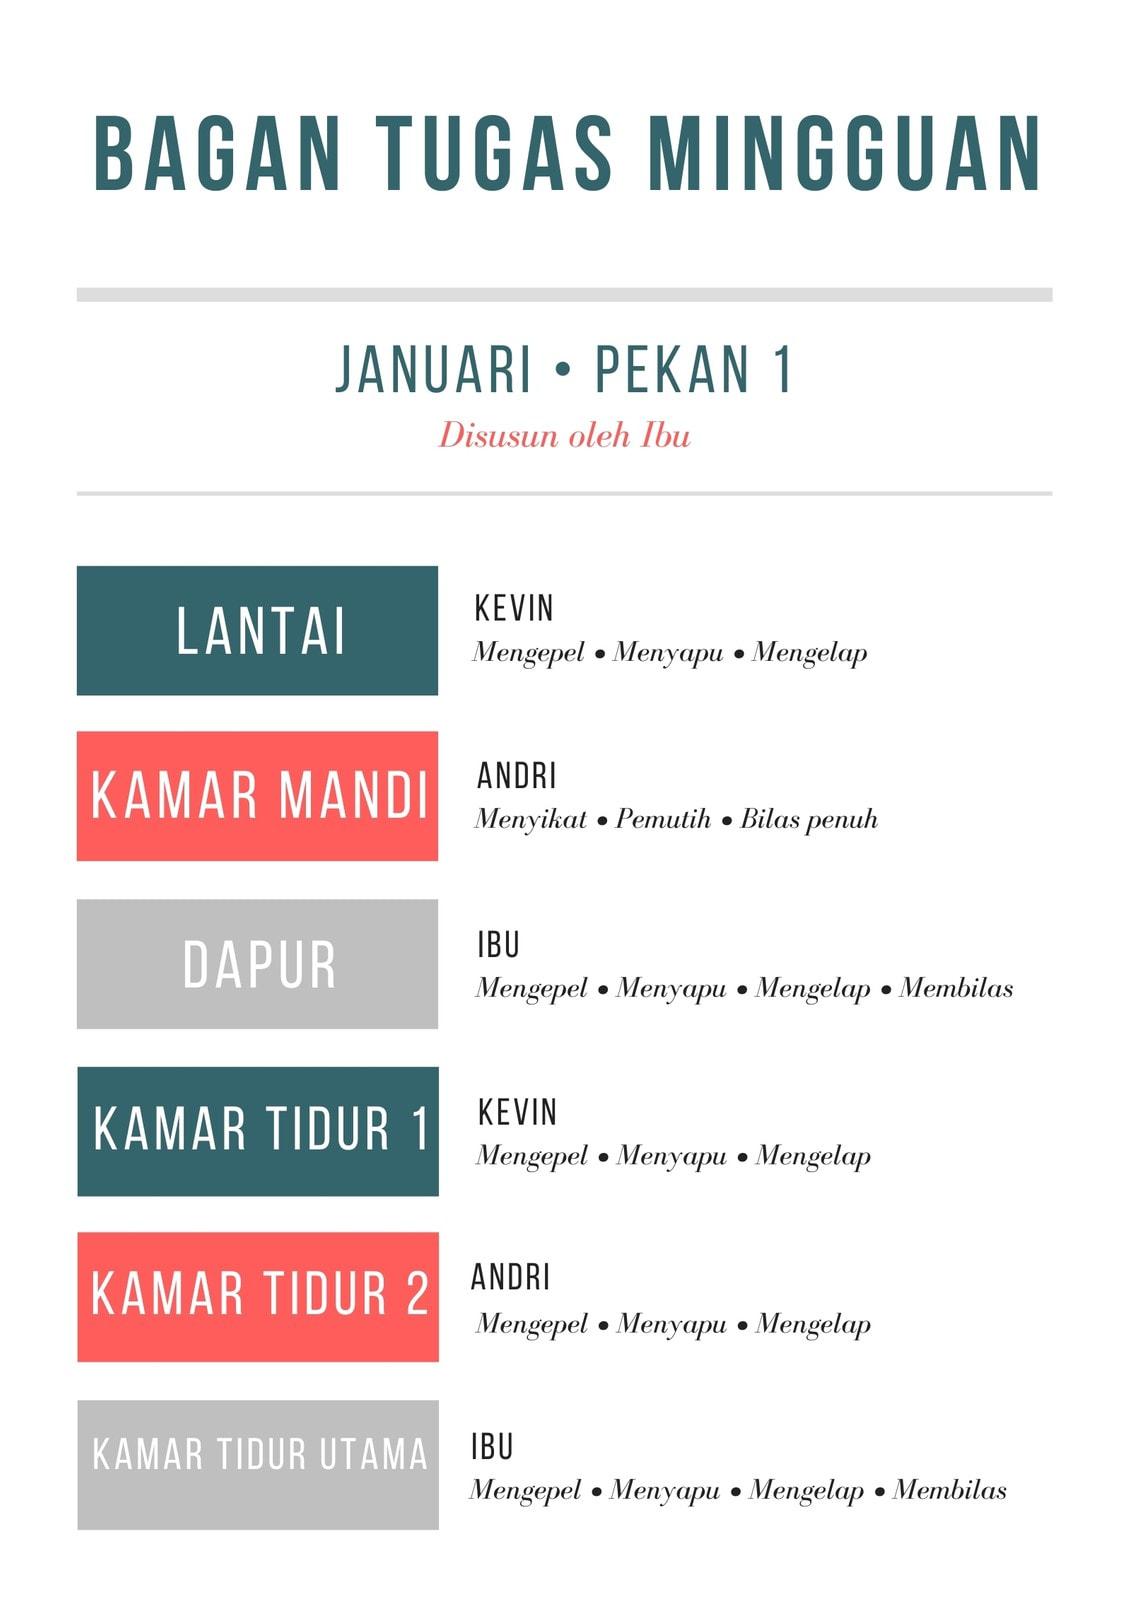 Bagan Agenda Tugas Sederhana Biru Kehijauan, Merah & Putih